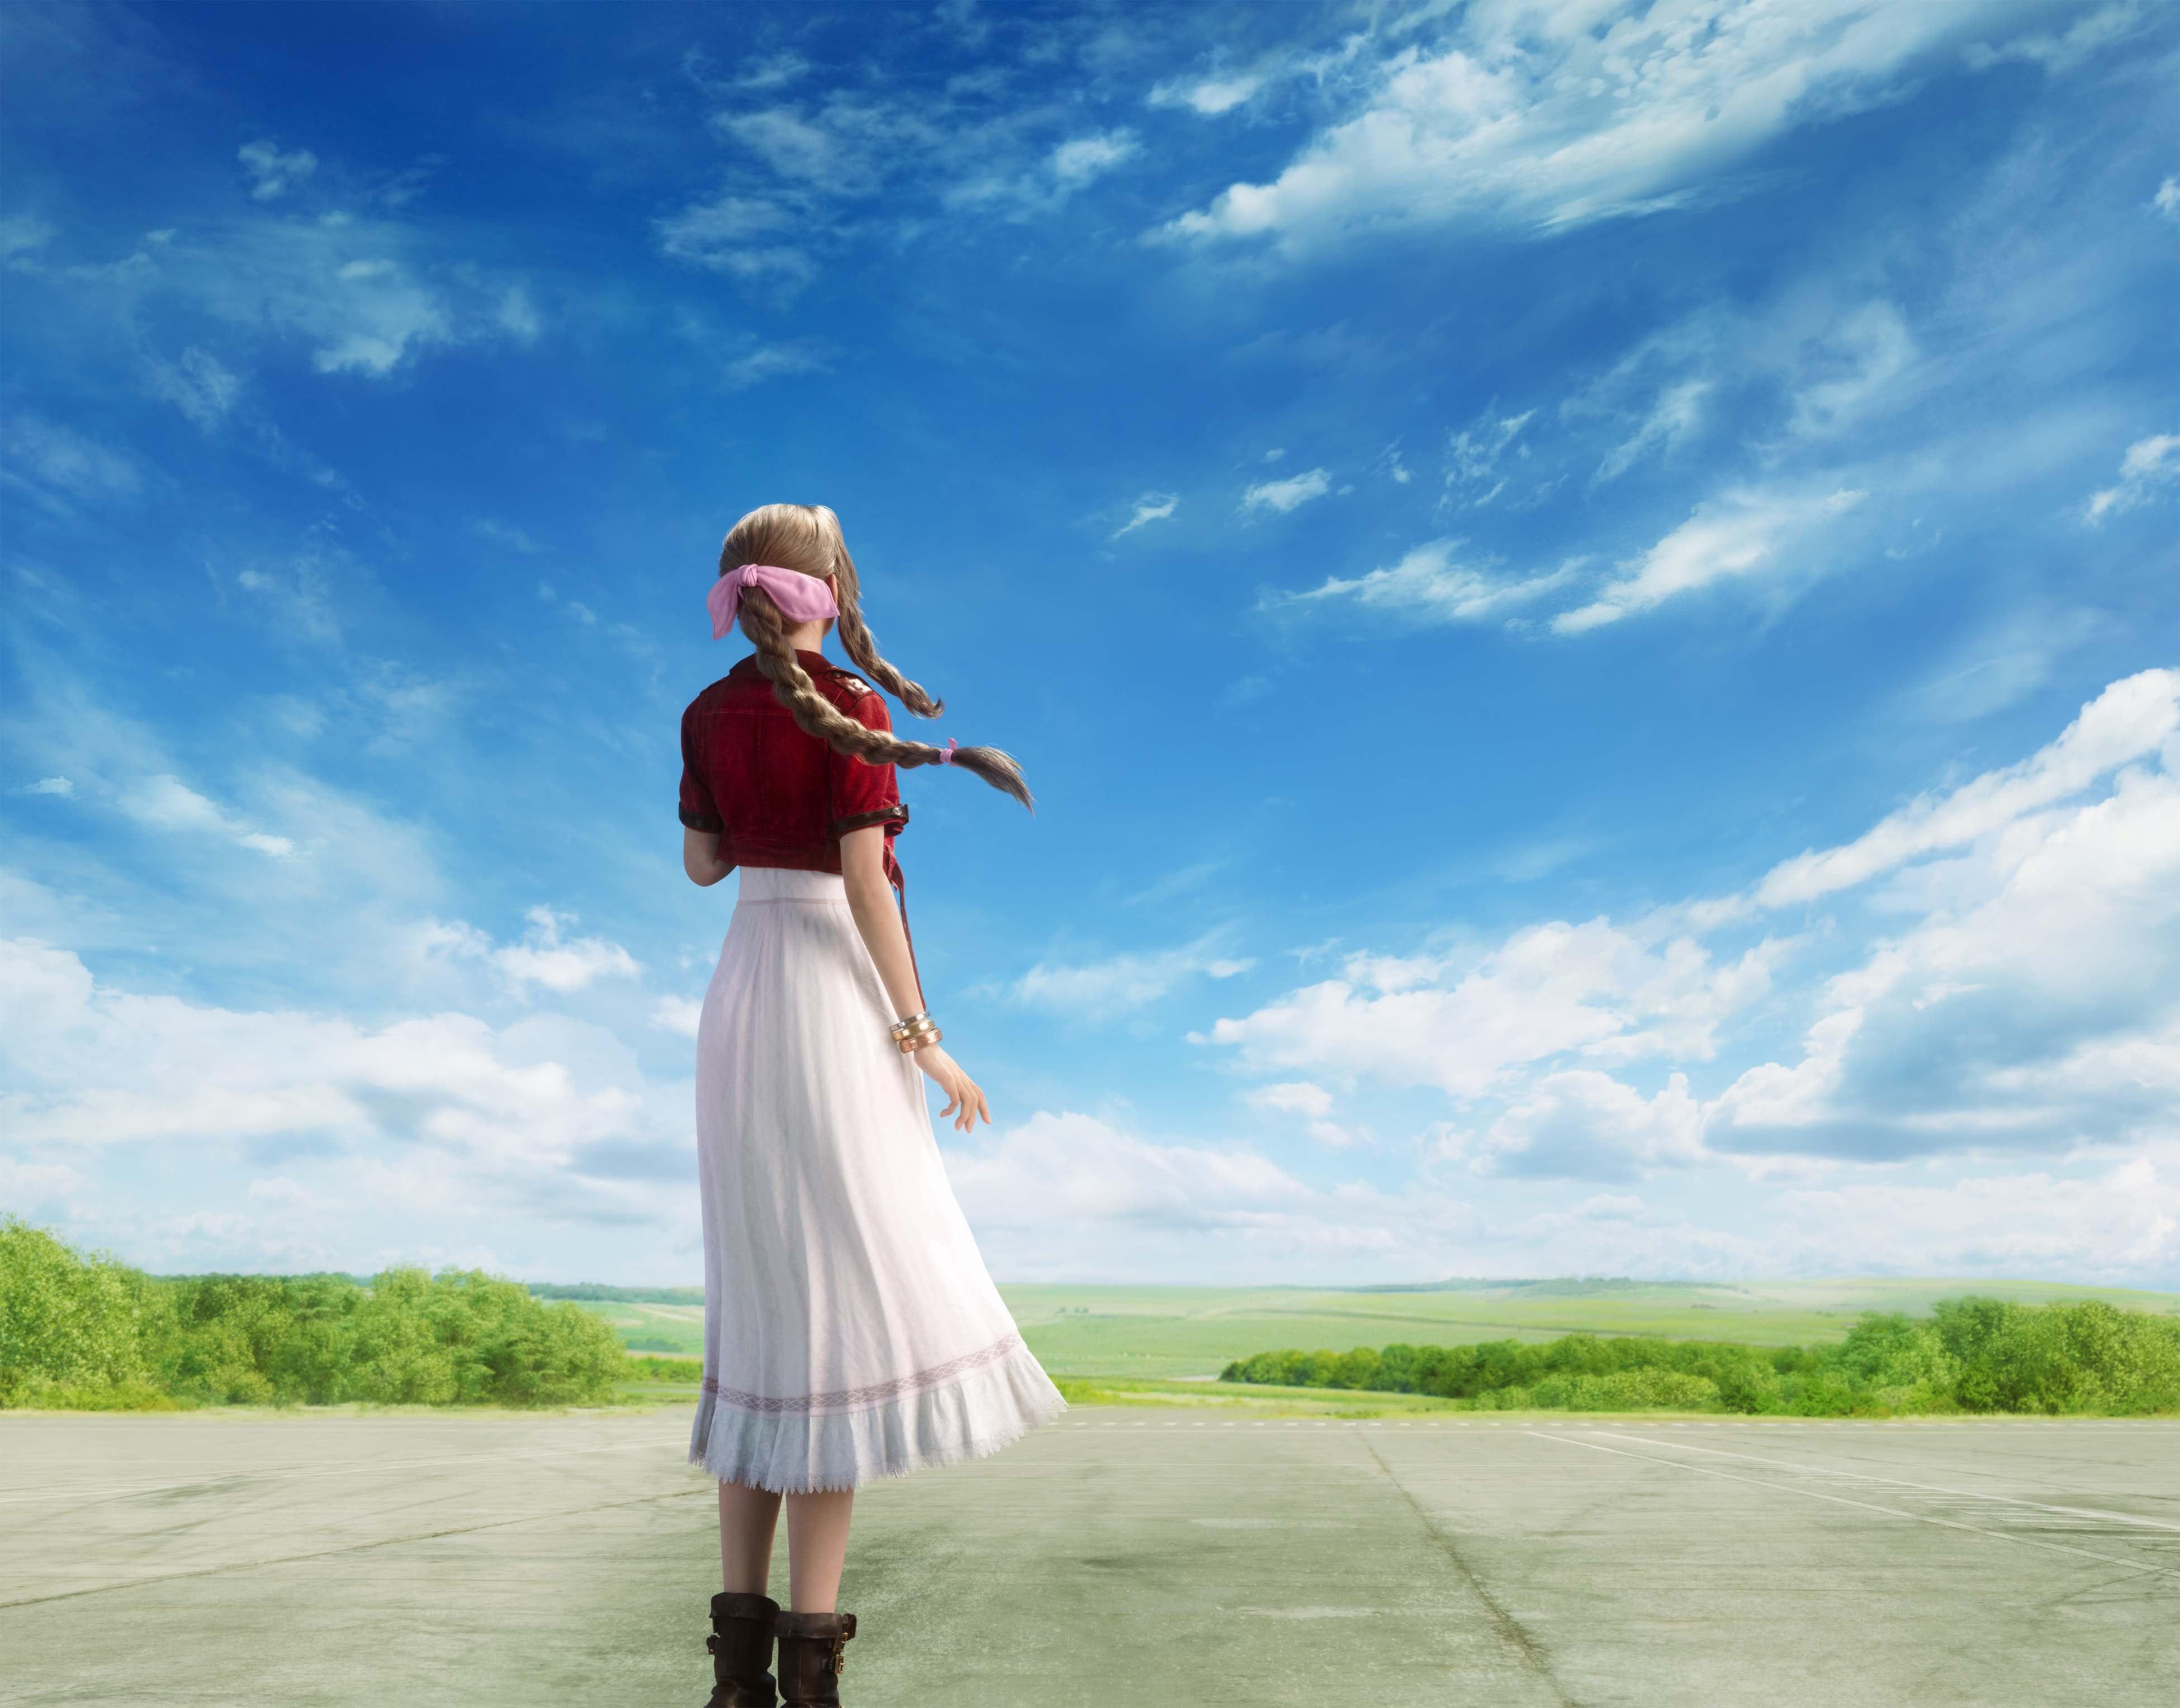 Final Fantasy 7 Remake Hands On Impressions Already A 2020 Goty